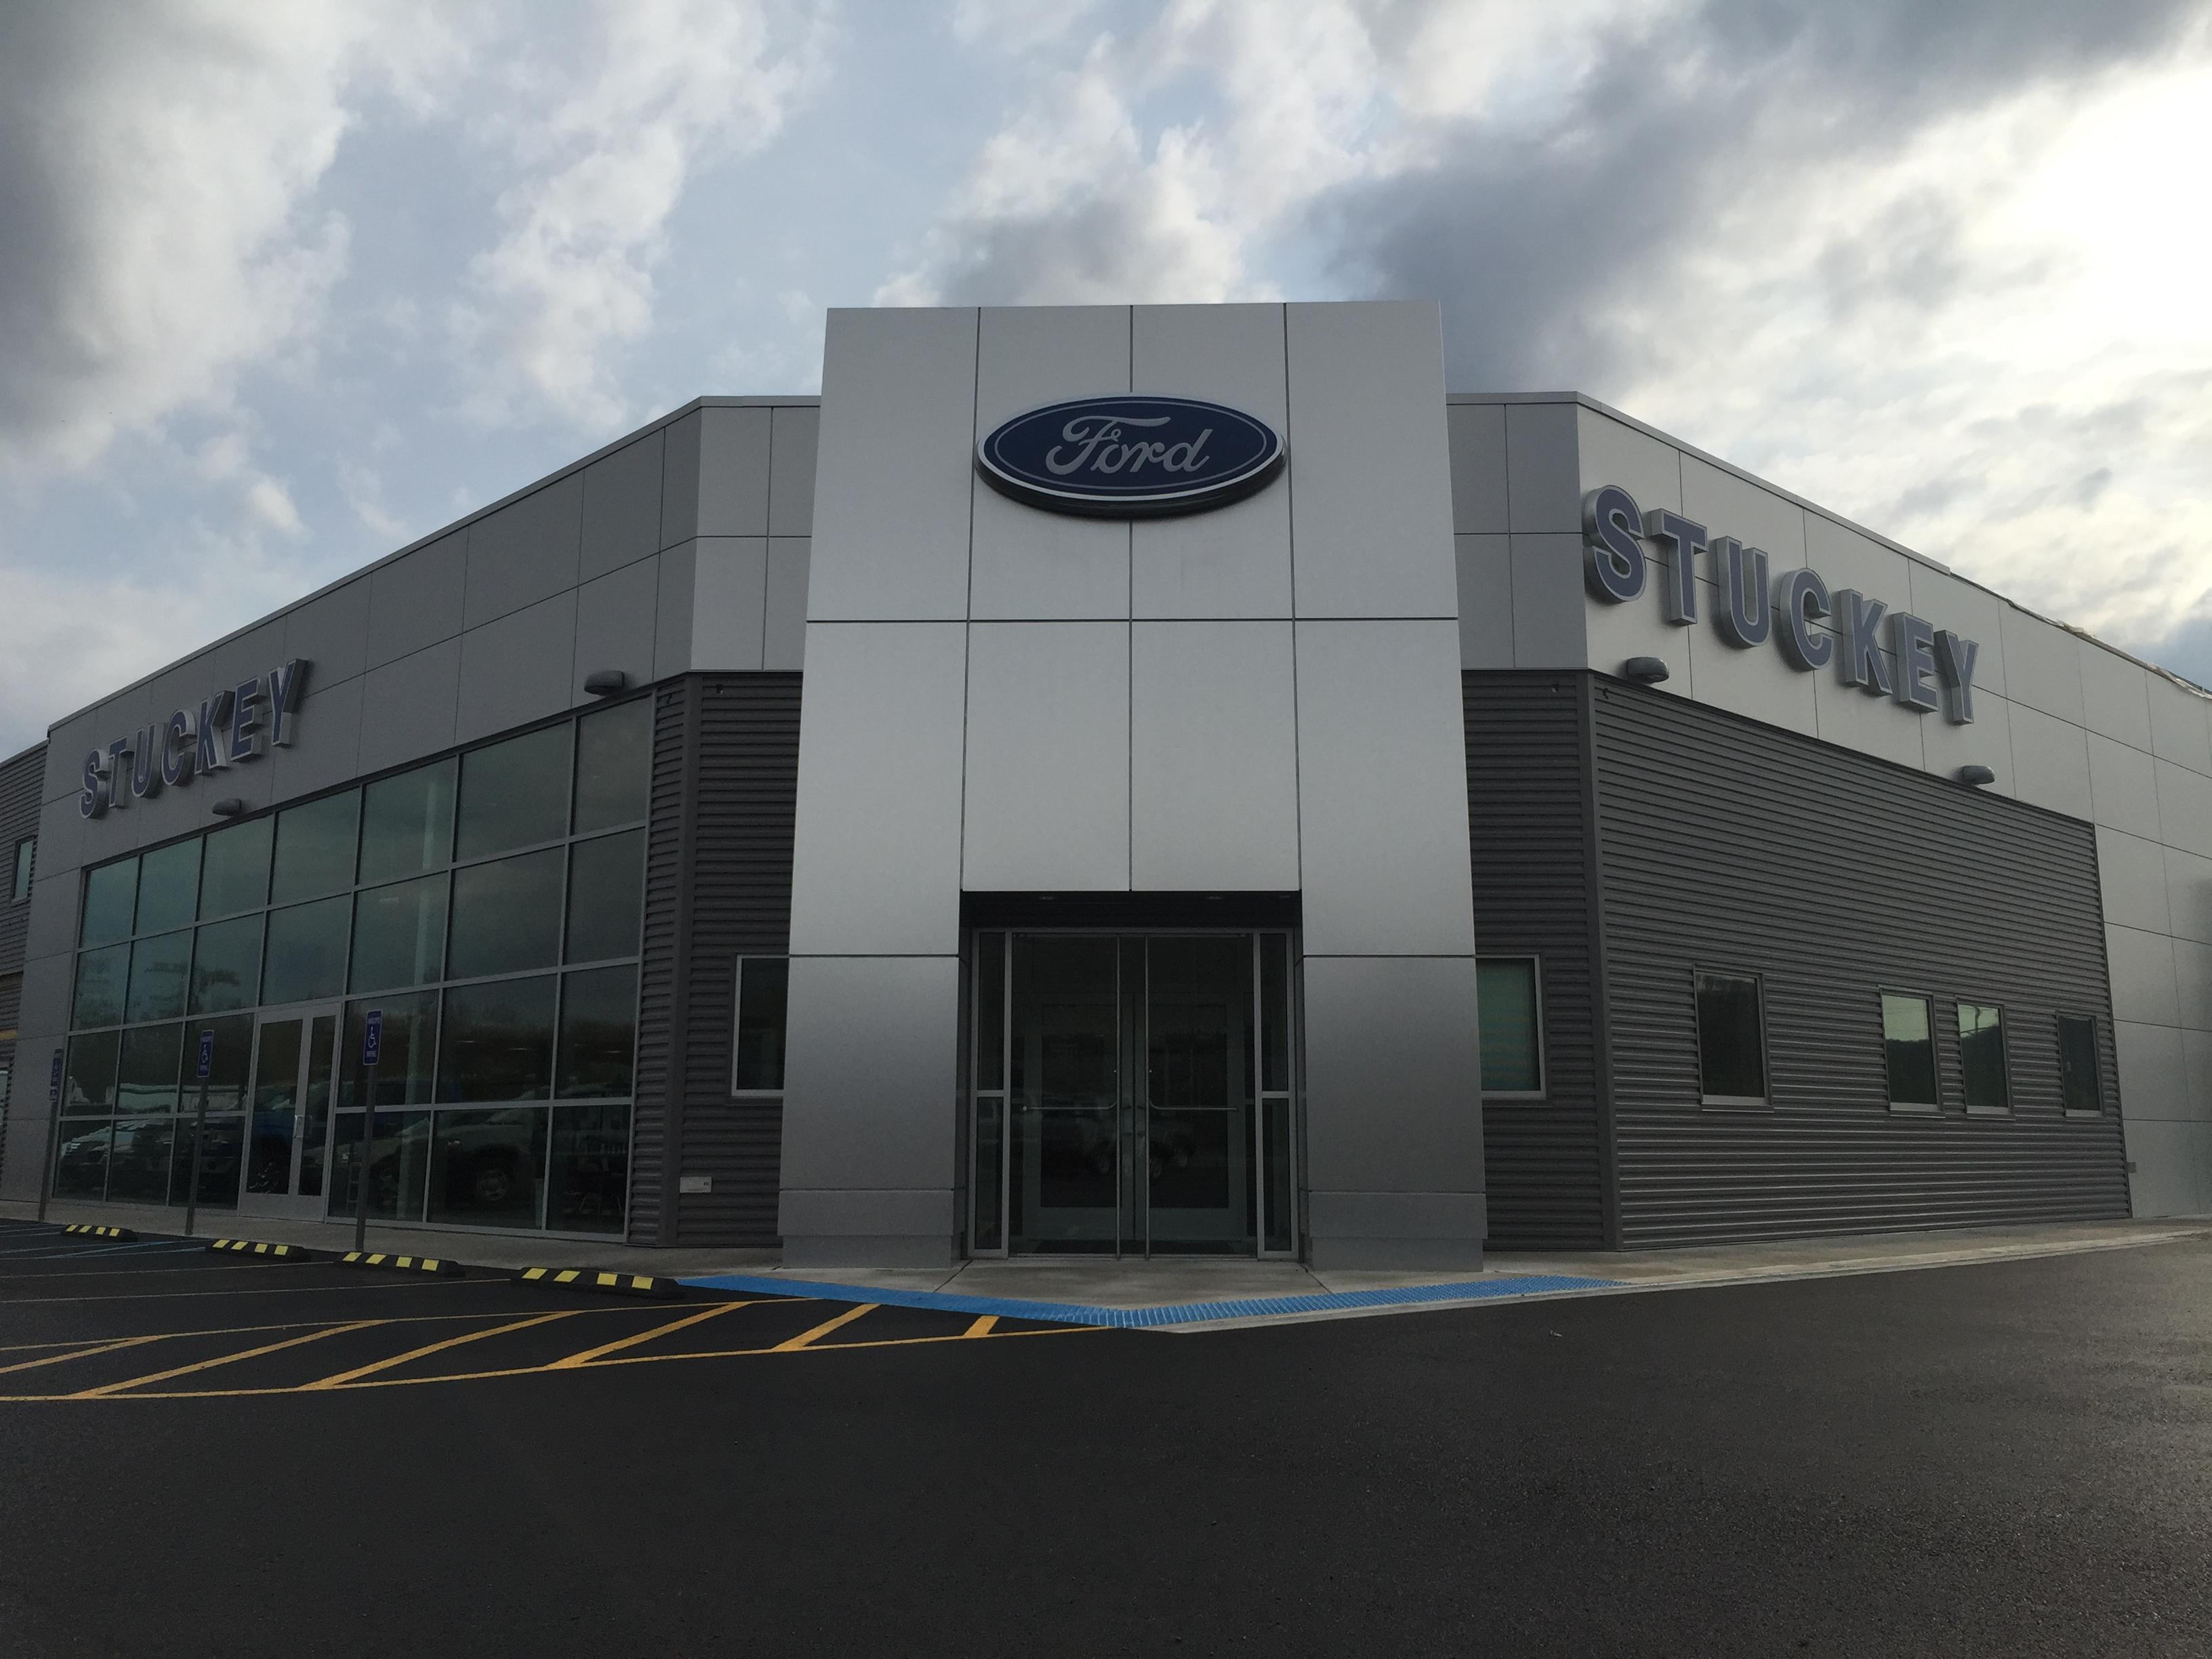 Stuckey Ford And Subaru